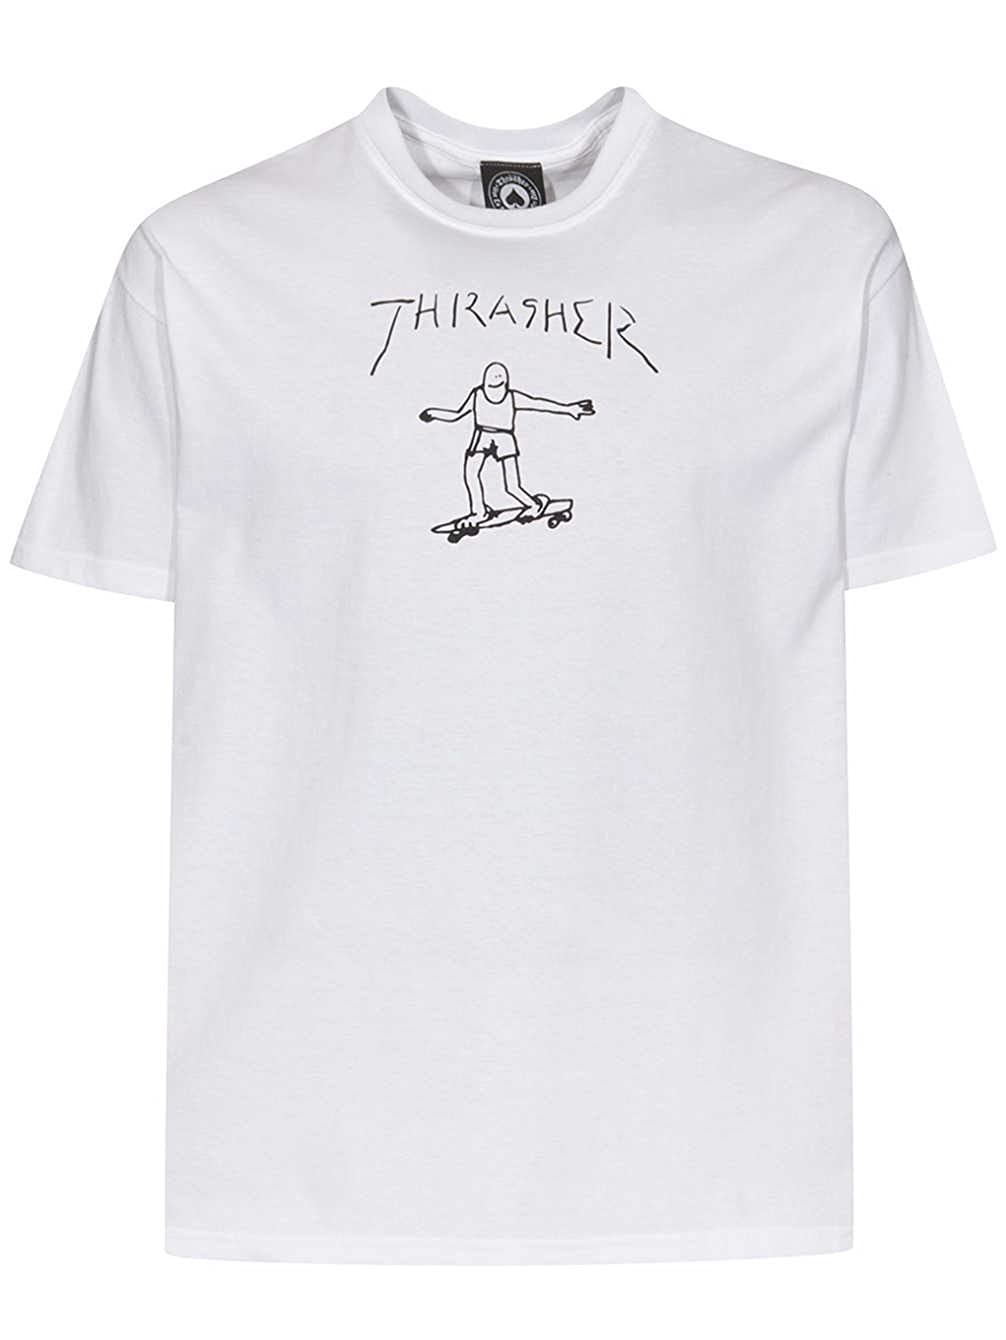 25566c59 Amazon.com: Thrasher